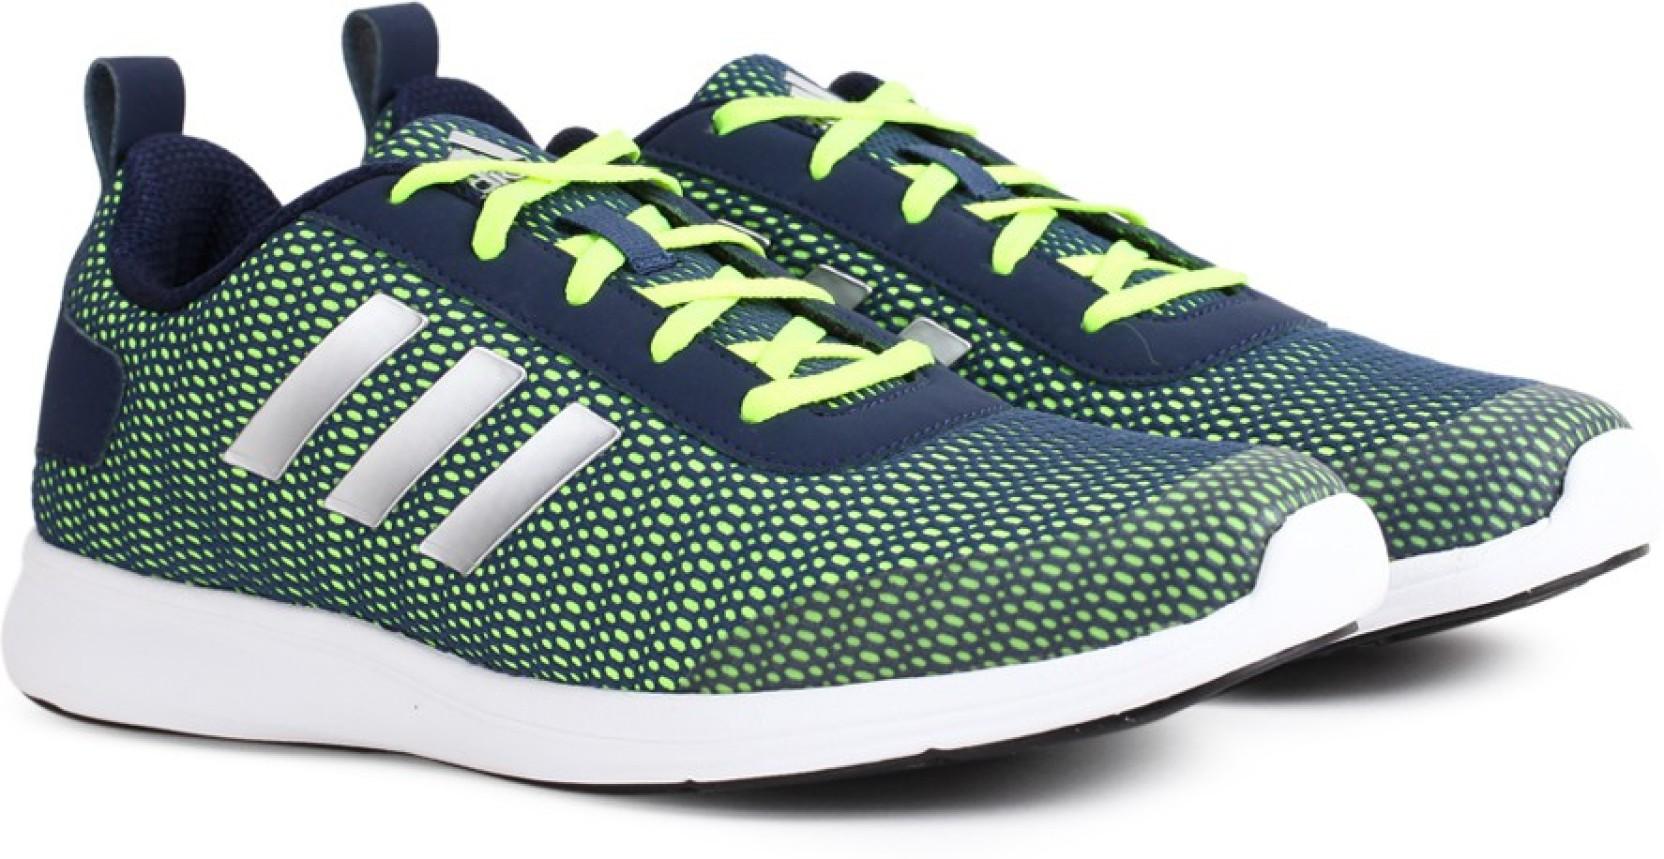 ADIDAS ADISPREE 2.0 M Running Shoes For